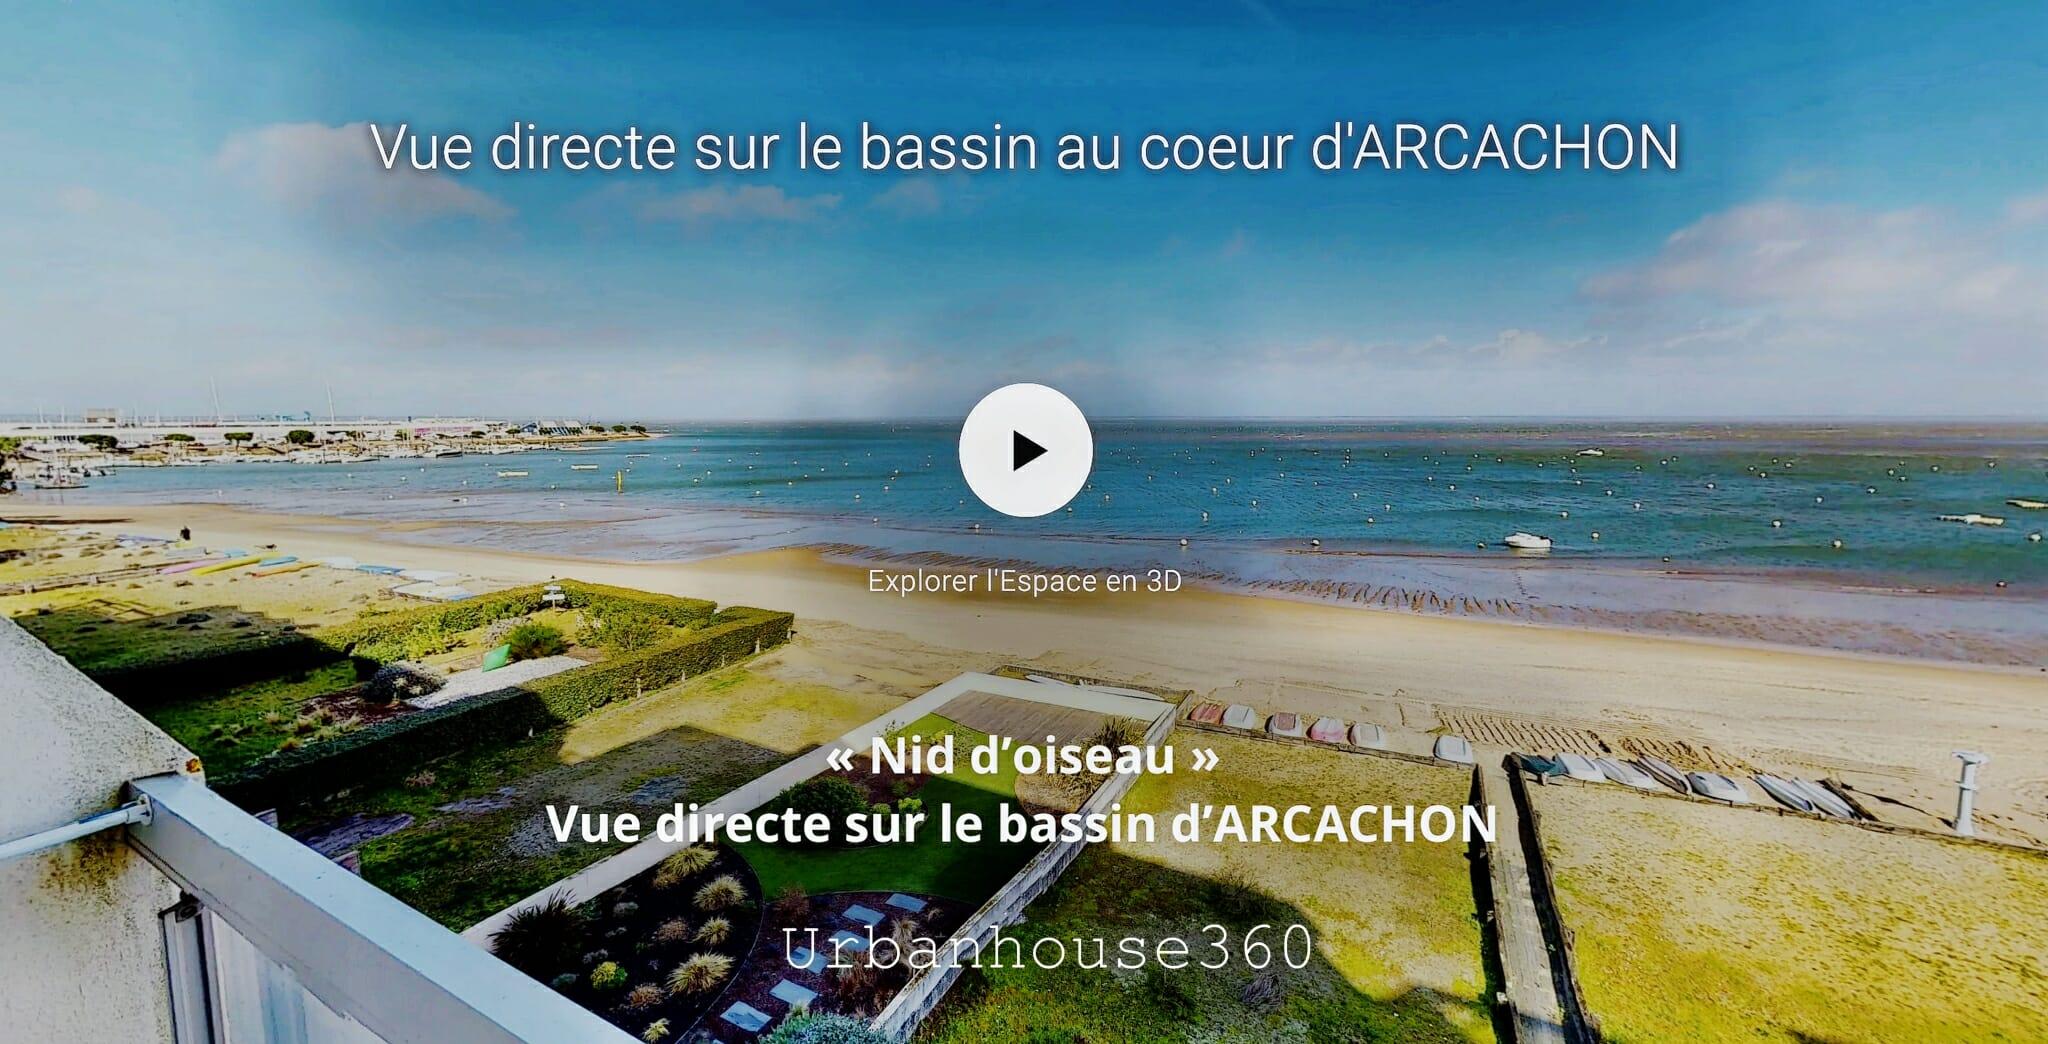 Urbanhouse360-Arcachon-3D